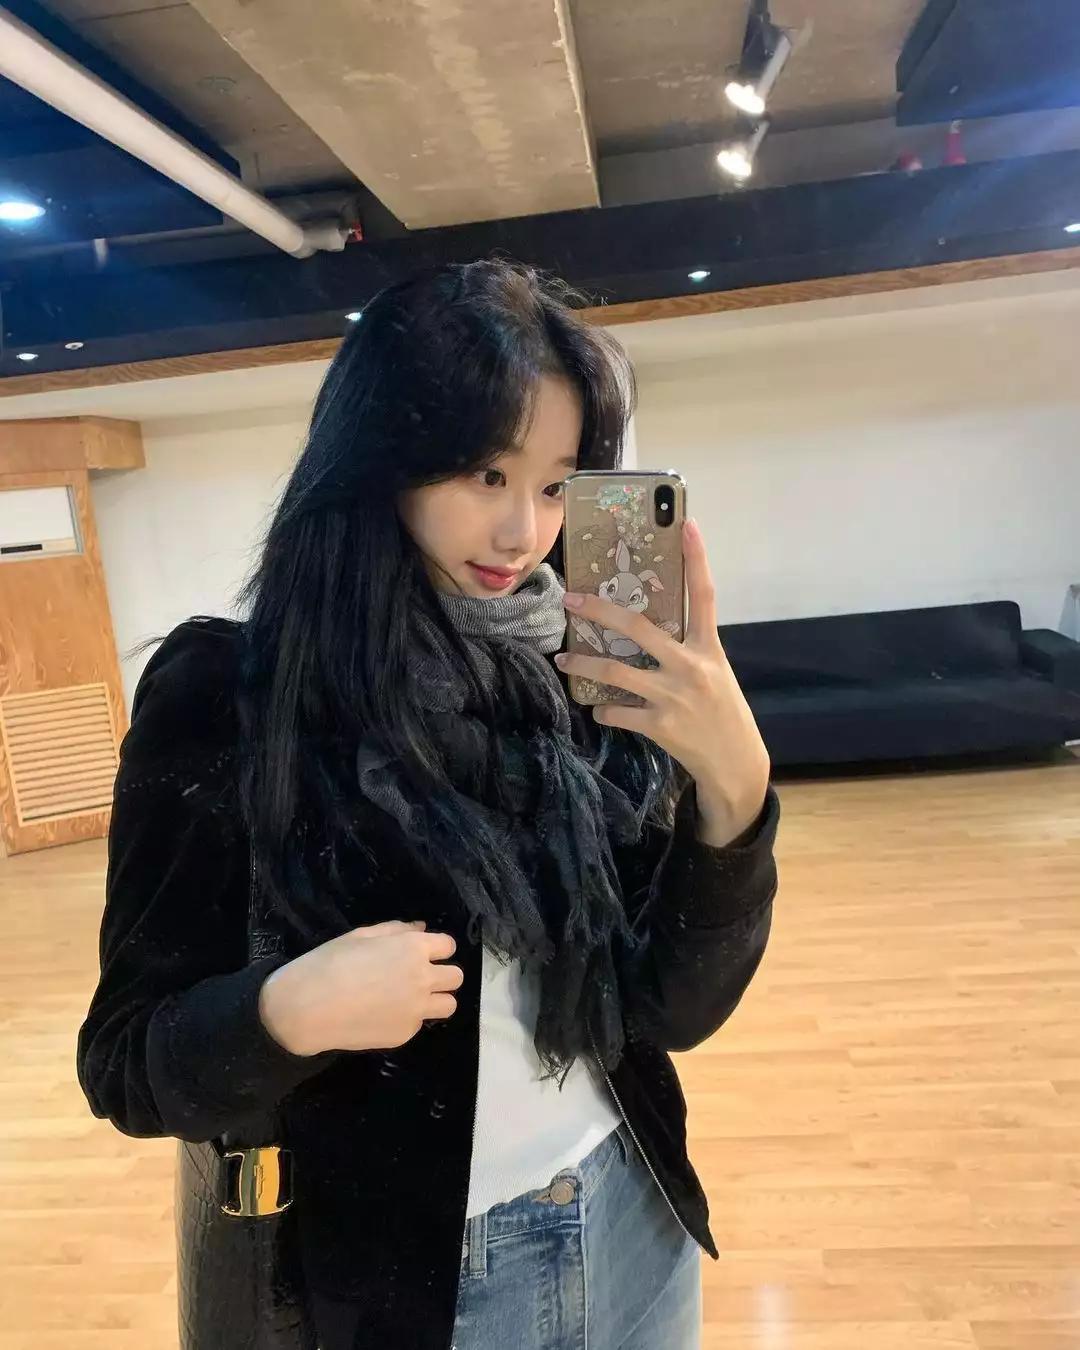 April成员李娜恩出演《认哥》展个人技,看来赚钱很辛苦